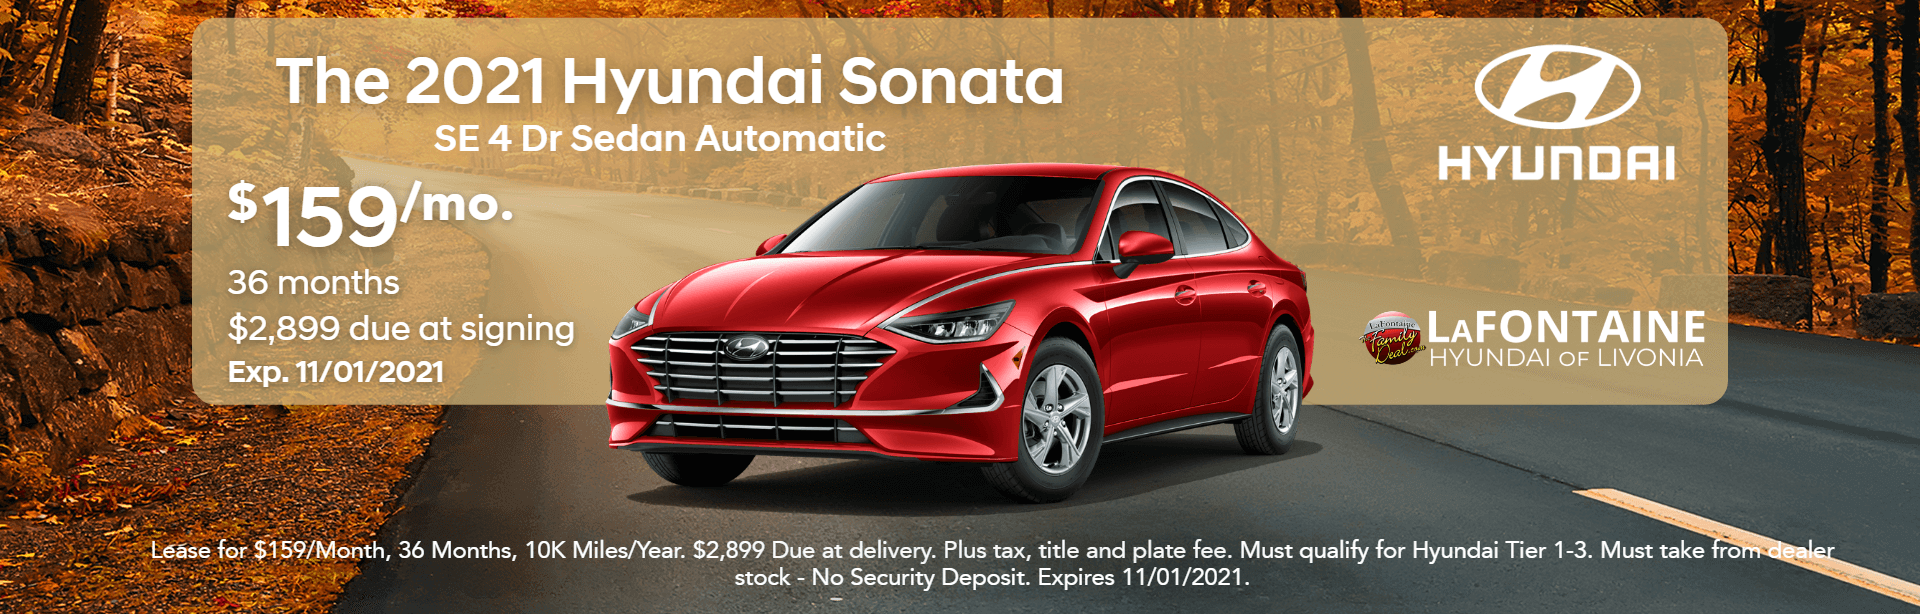 2021_Hyundai_Sonata_SE_Wed Oct 13 2021 12_07_39 GMT-0400 (Eastern Daylight Time)